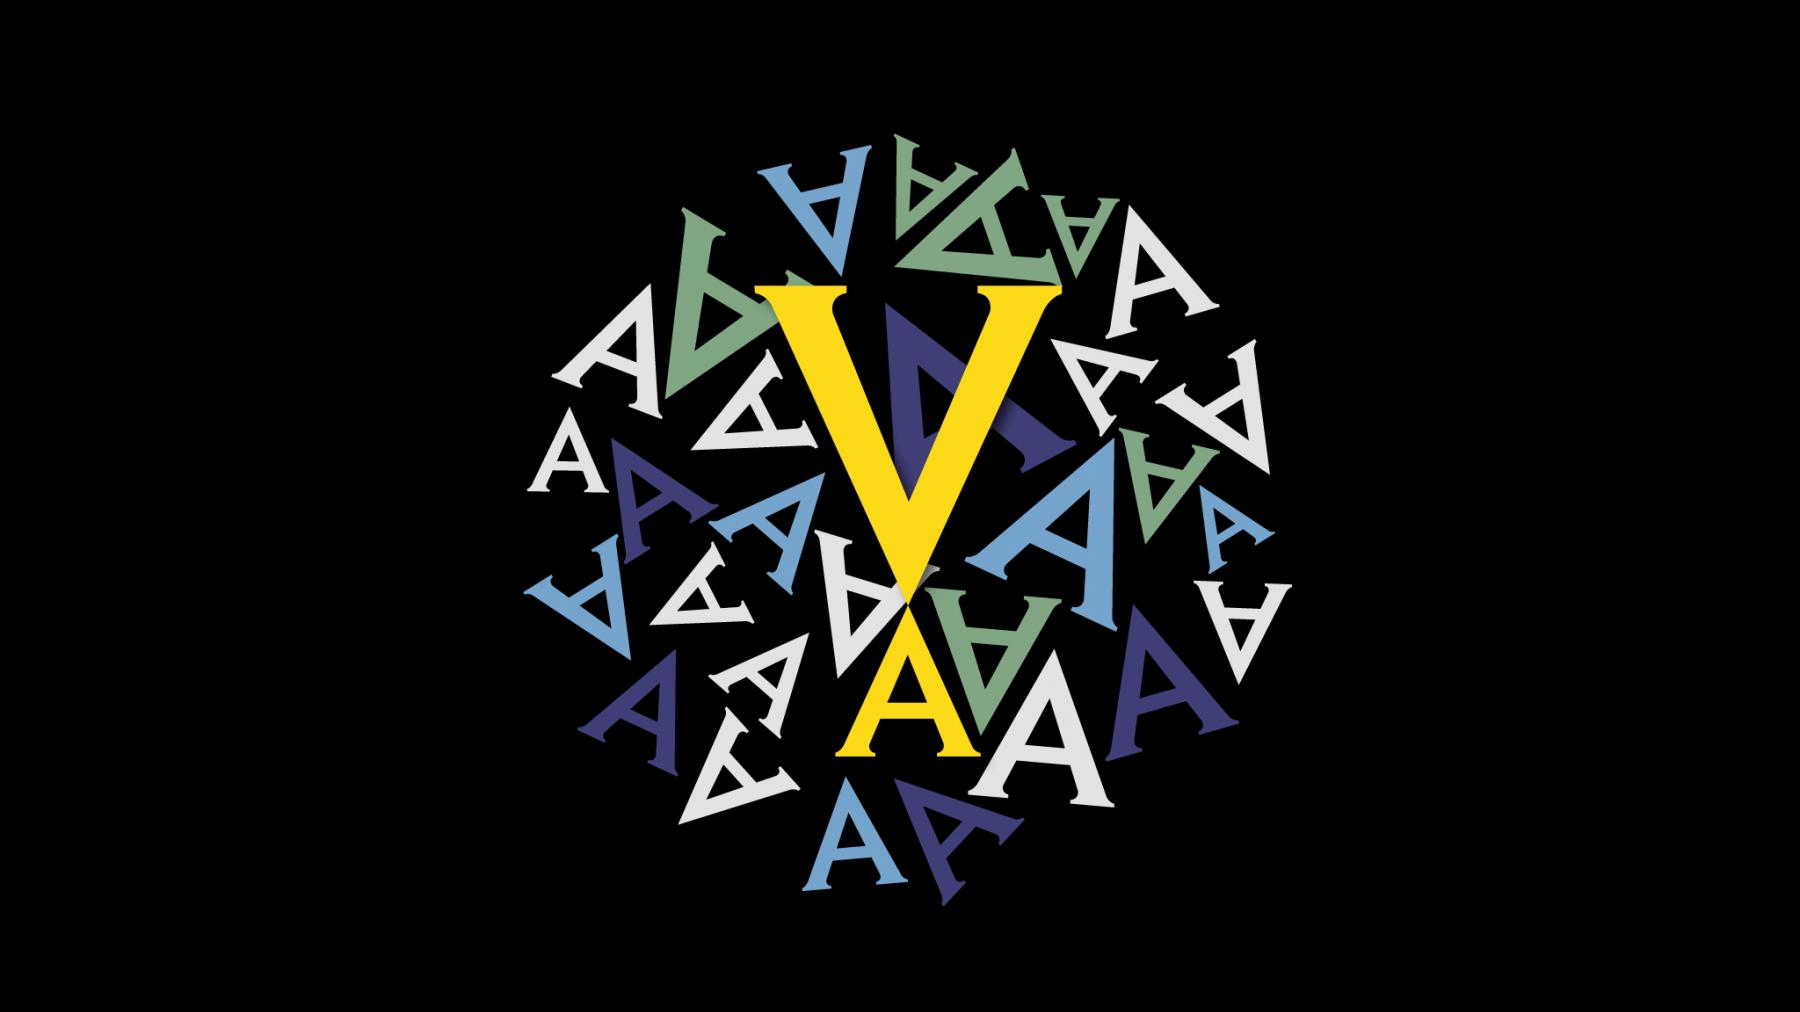 Disseny Vilarnau 2015